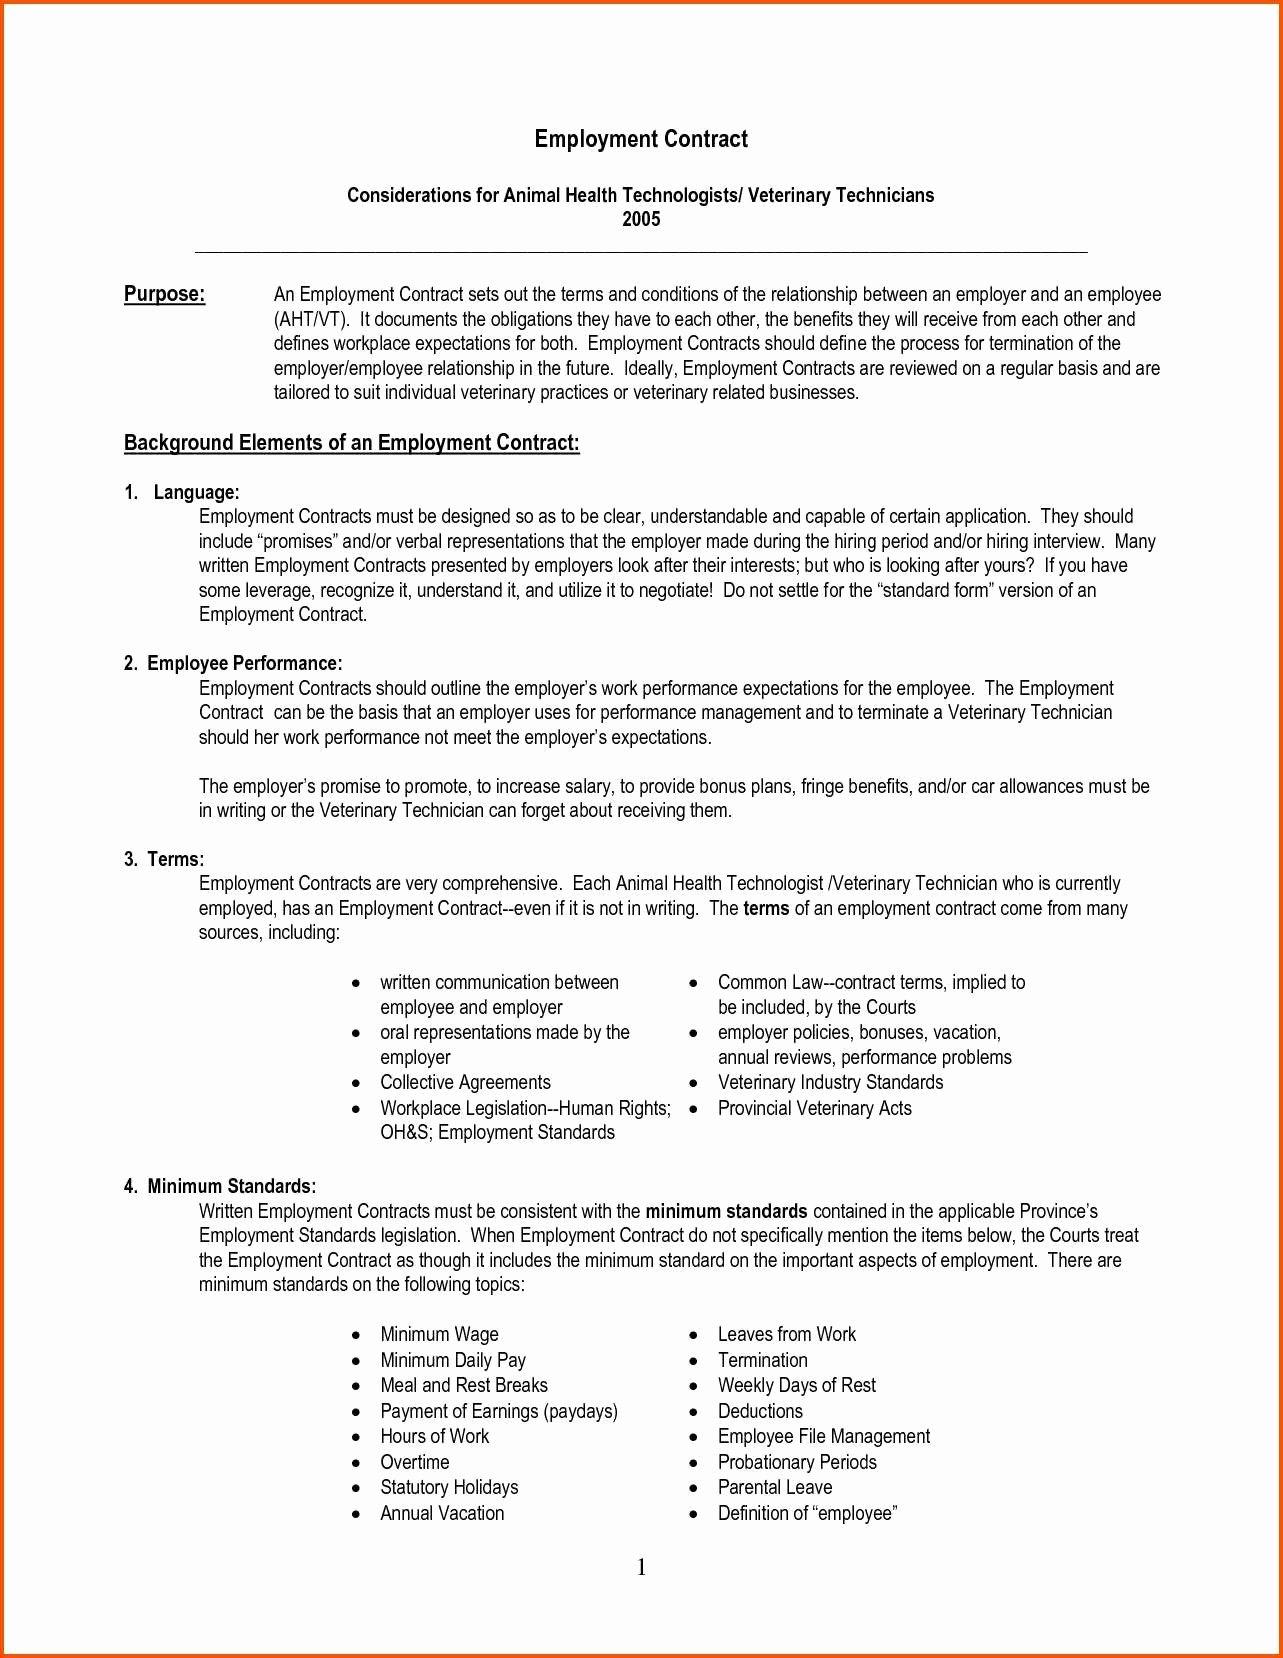 Employment Agreement Vs Employment Contract original